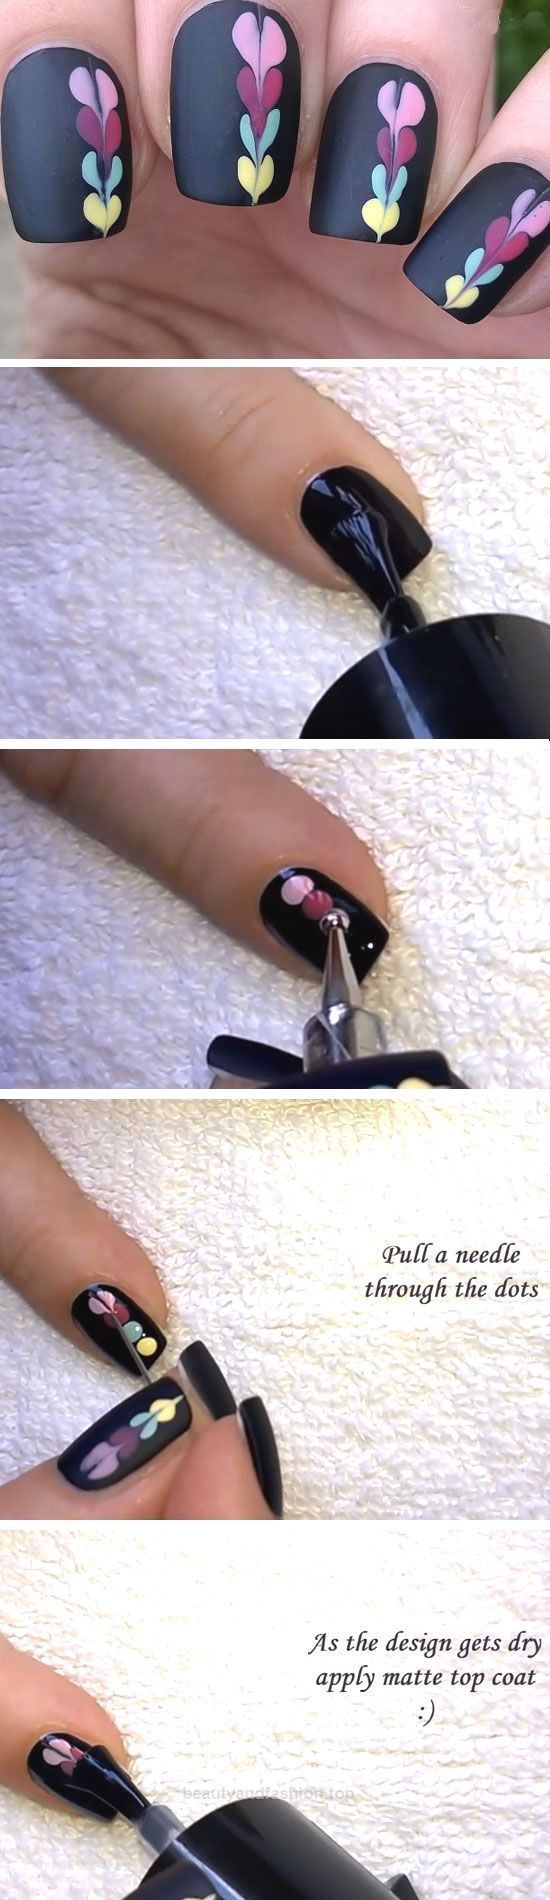 Photo of Smalto per unghie Just Nails Gel Nails Piano miniature Nageldesign Hübs